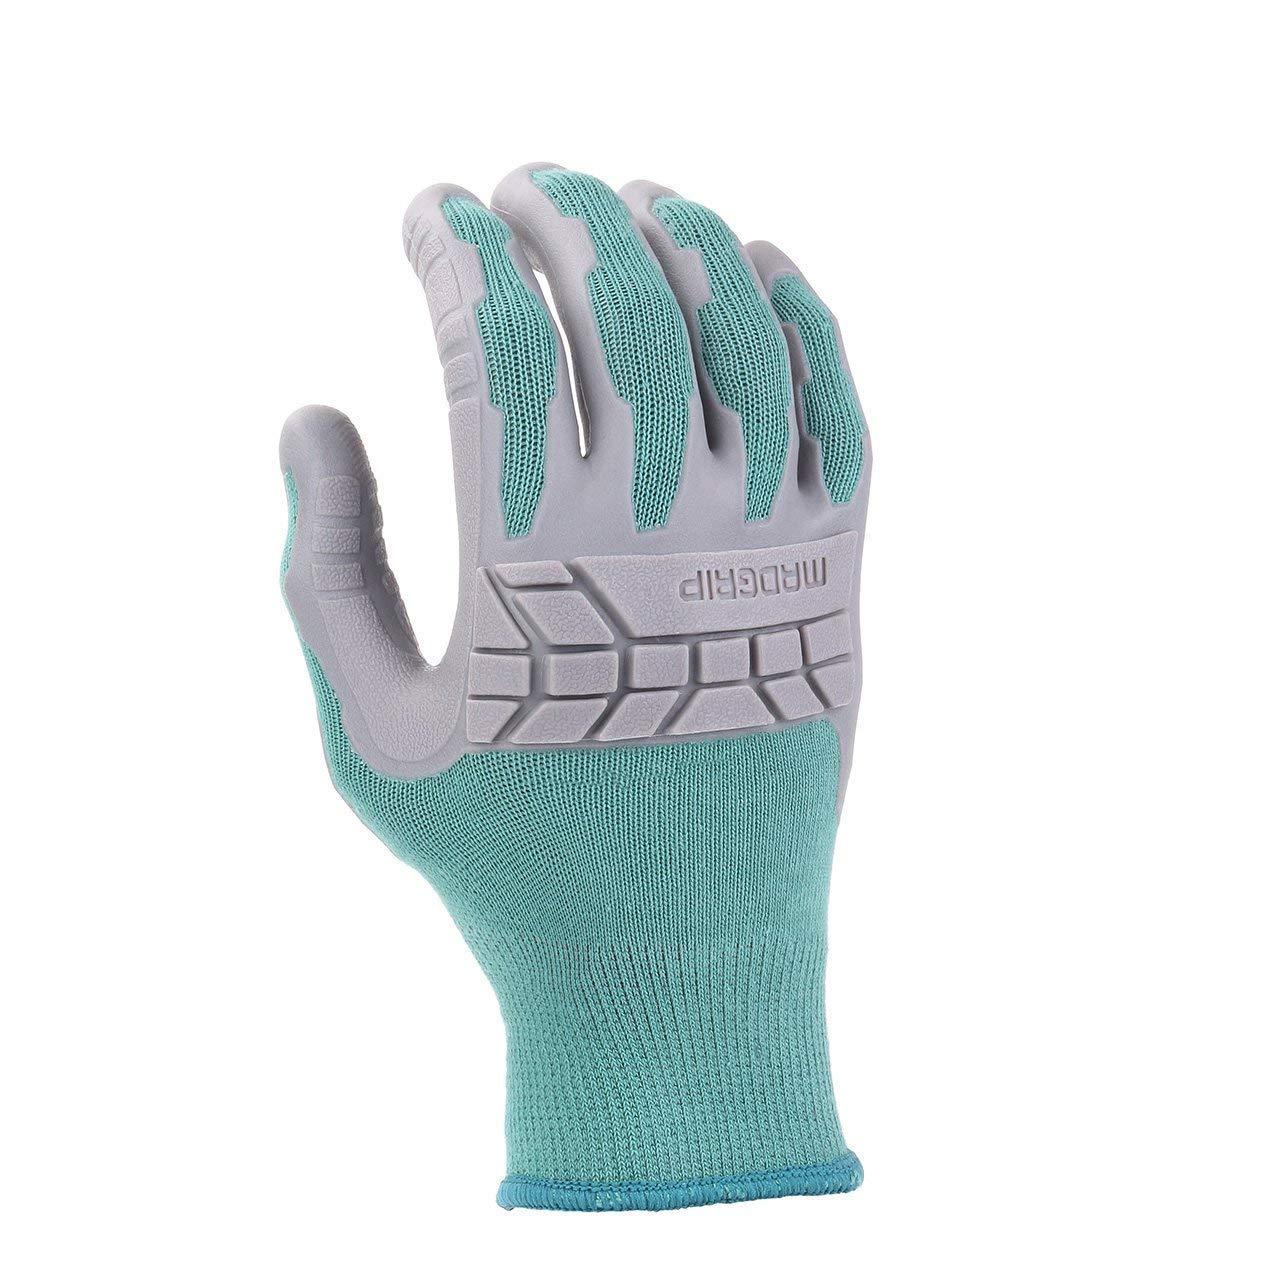 MadGrip Pro Palm Utility Glove